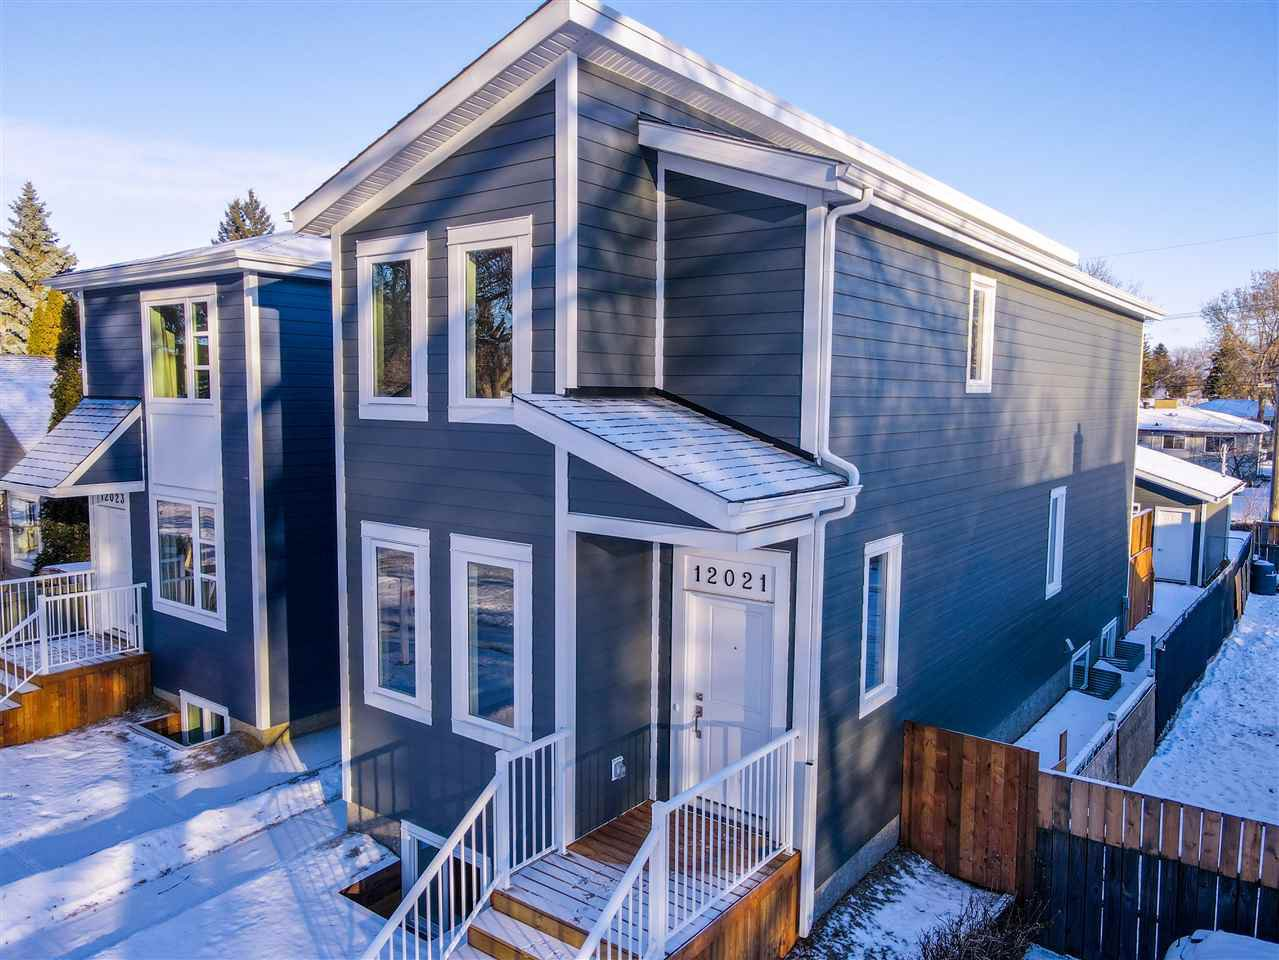 Main Photo: 12021 40 Street in Edmonton: Zone 23 House for sale : MLS®# E4221902